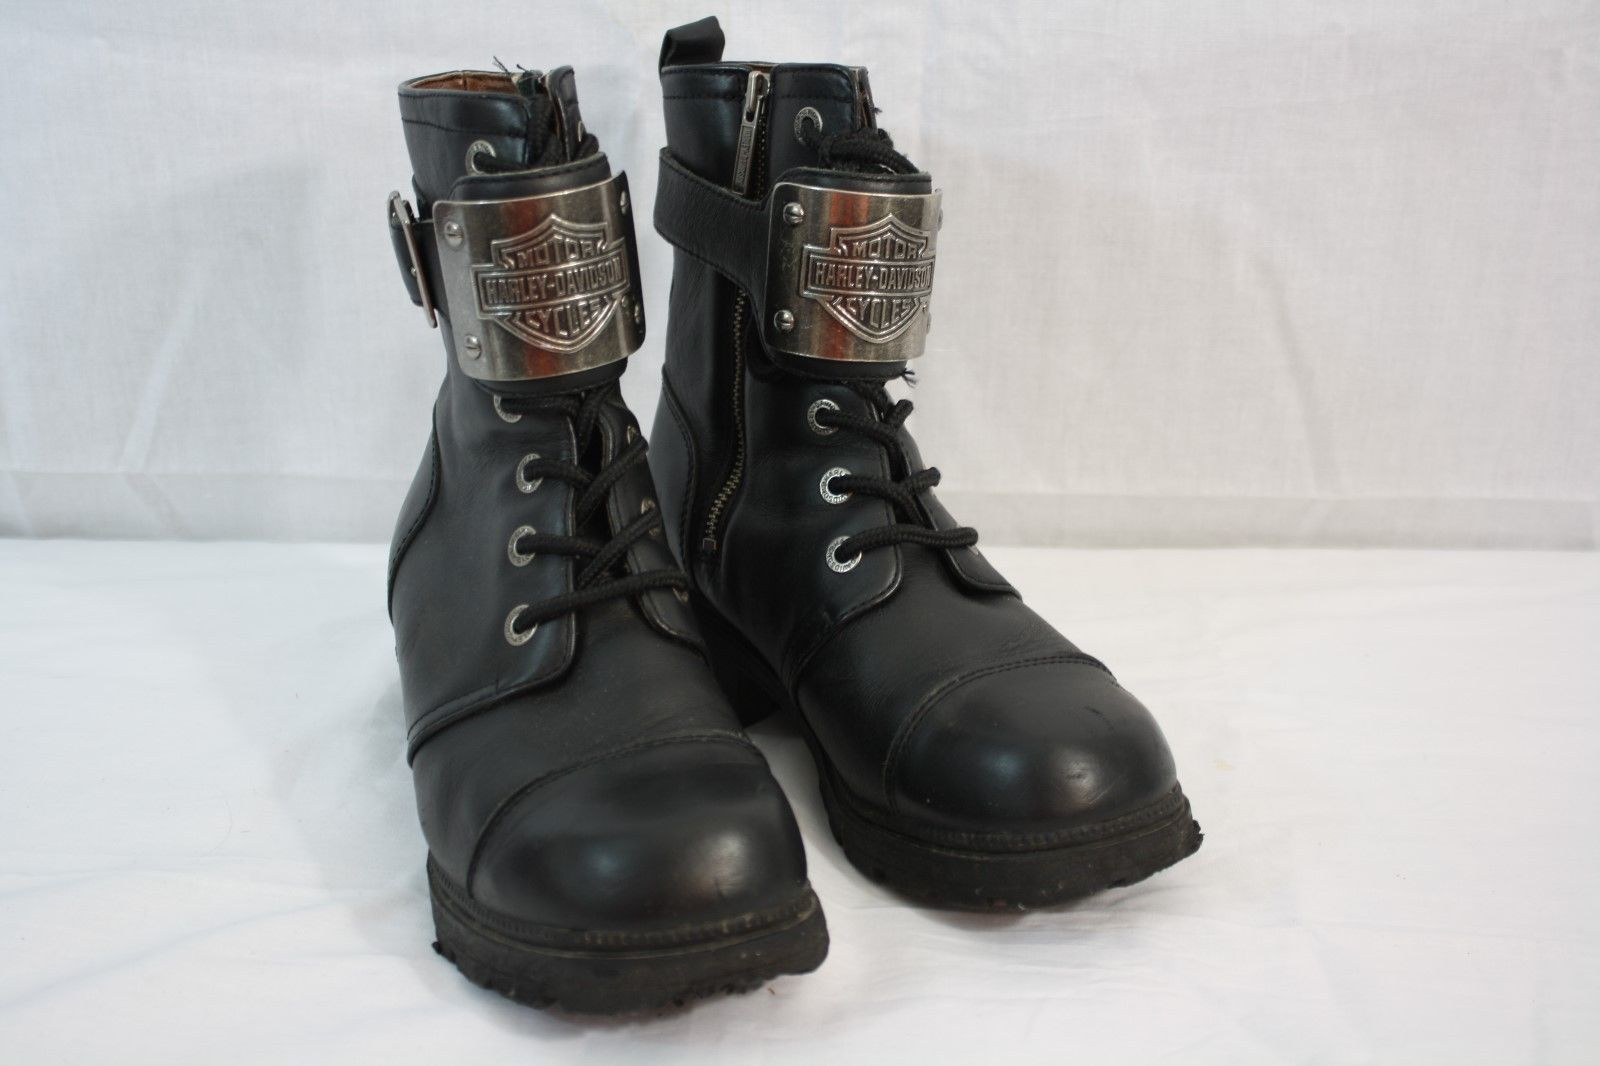 1b42ea88f5cb S l1600. S l1600. Women s Harley Davidson Black Leather Ankle Boots Size 7  - Metal Plate. Women s ...